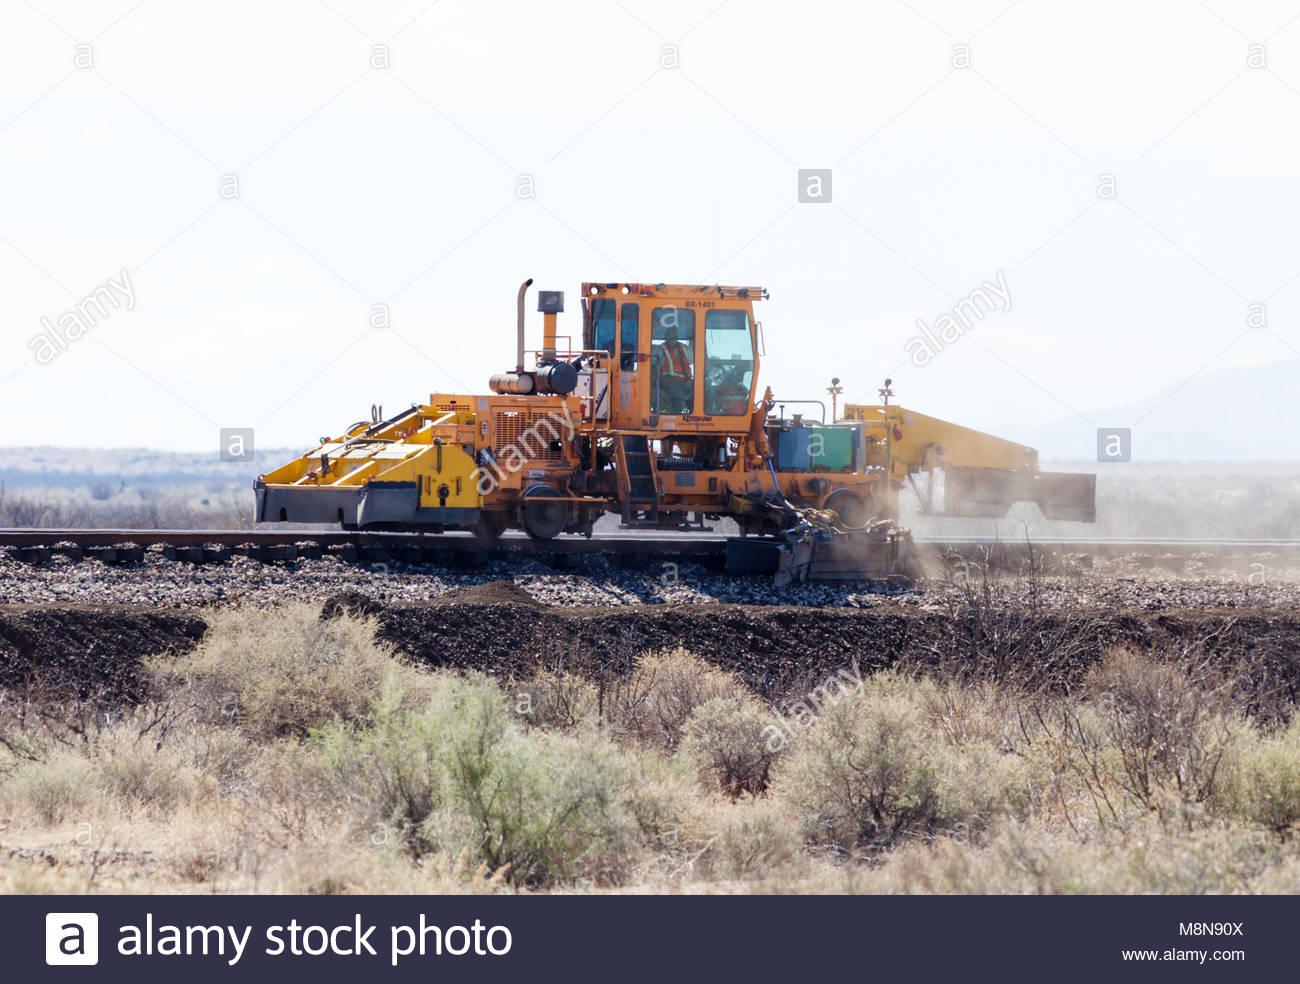 Kershaw Ballast Regulator Machine on railroad tracks in southeastern Arizona, USA, operator visible - Stock Image